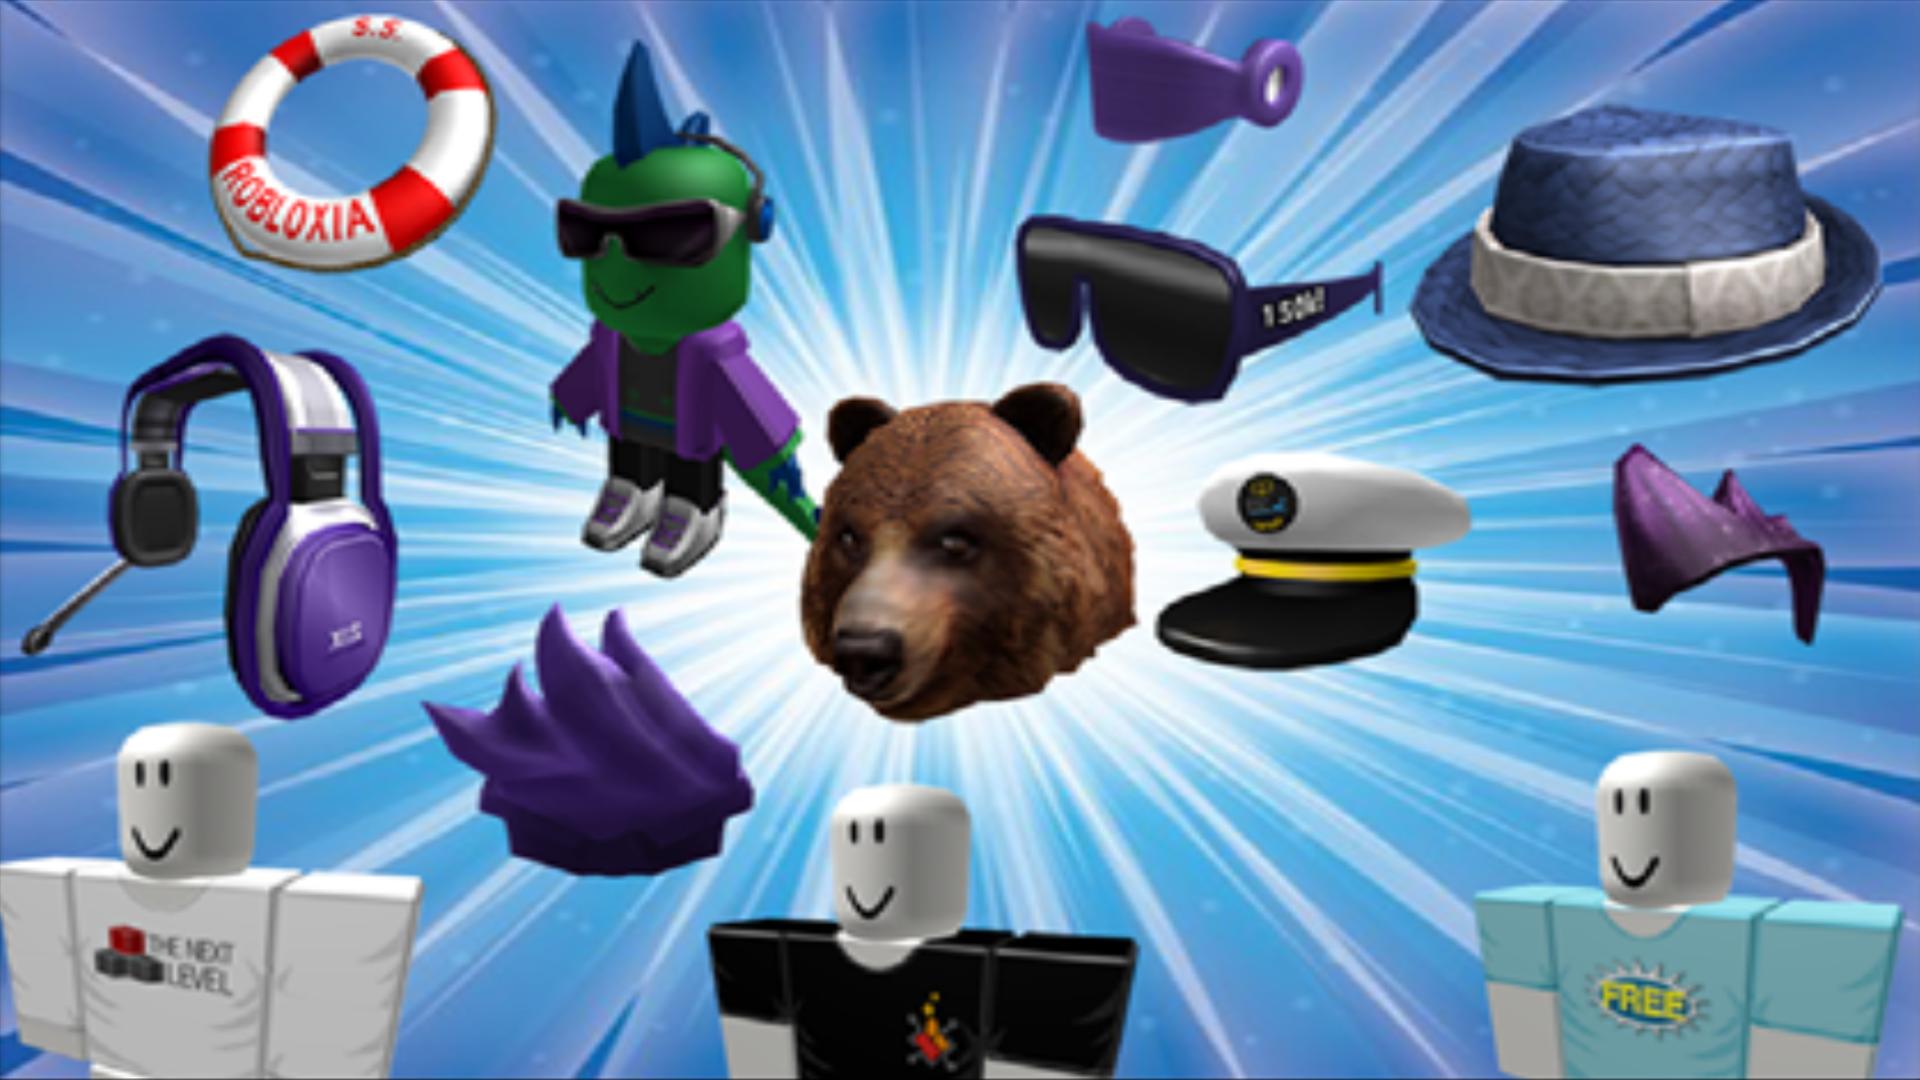 Roblox Promo Codes 2020 Wikipedia لم يسبق له مثيل الصور Tier3 Xyz